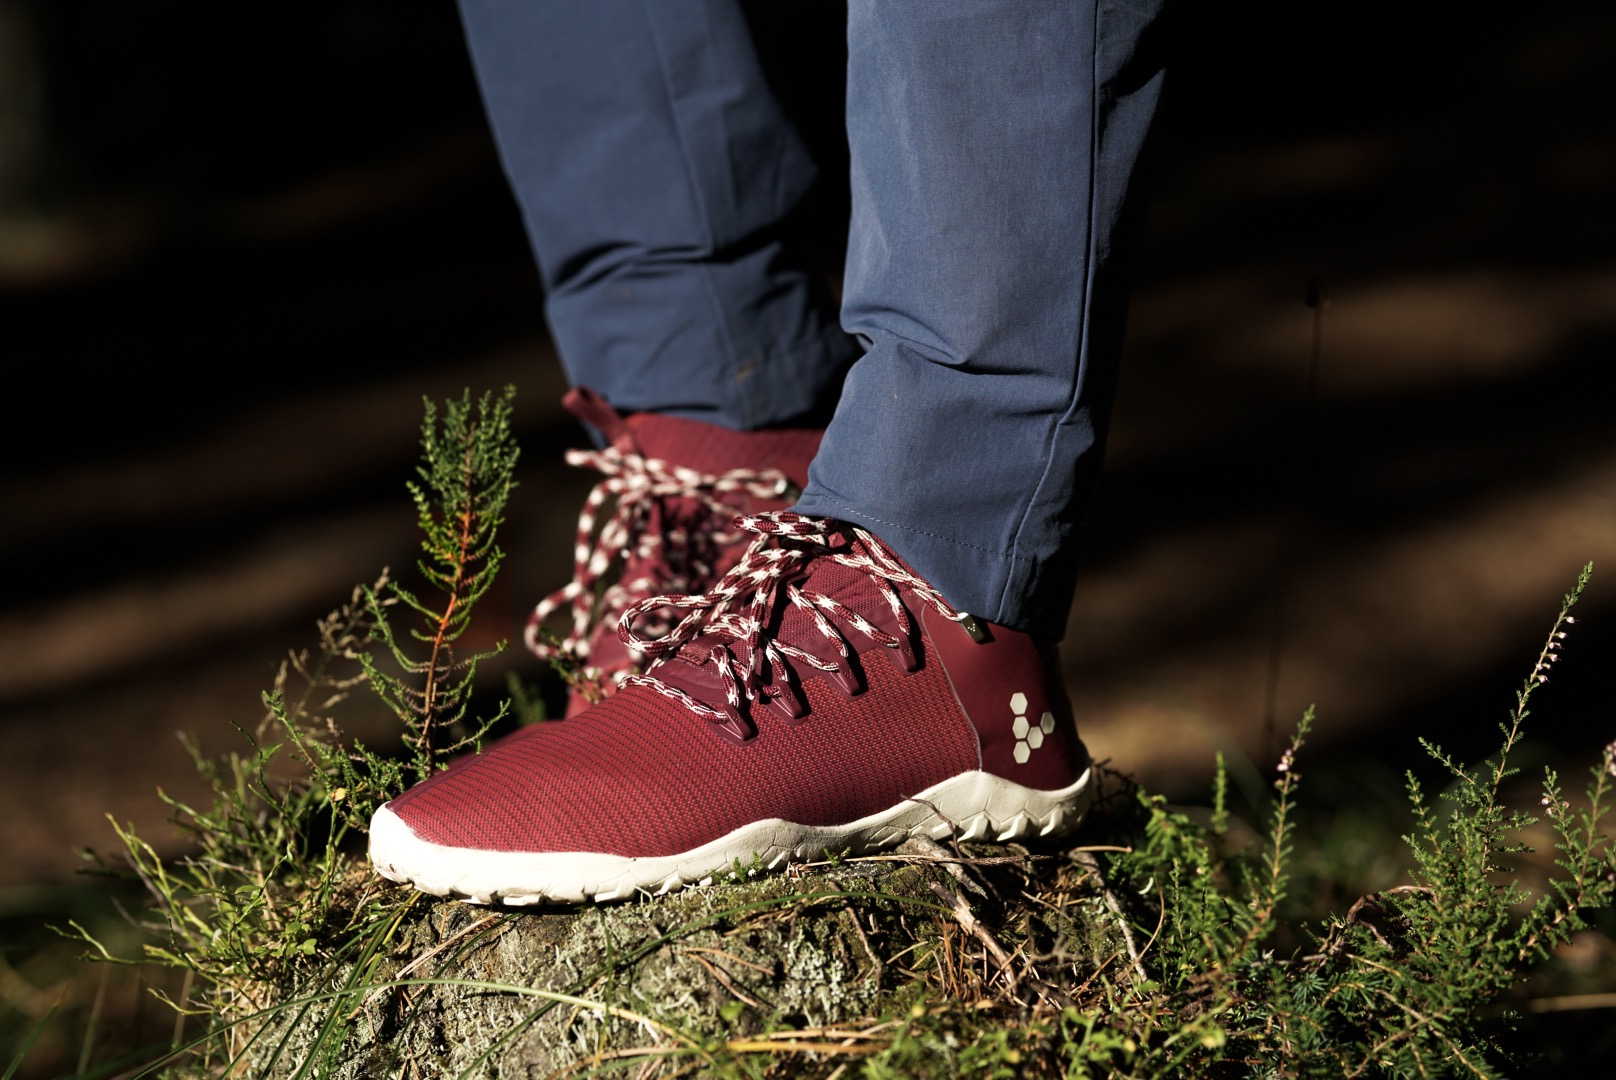 VIVO barefoot -